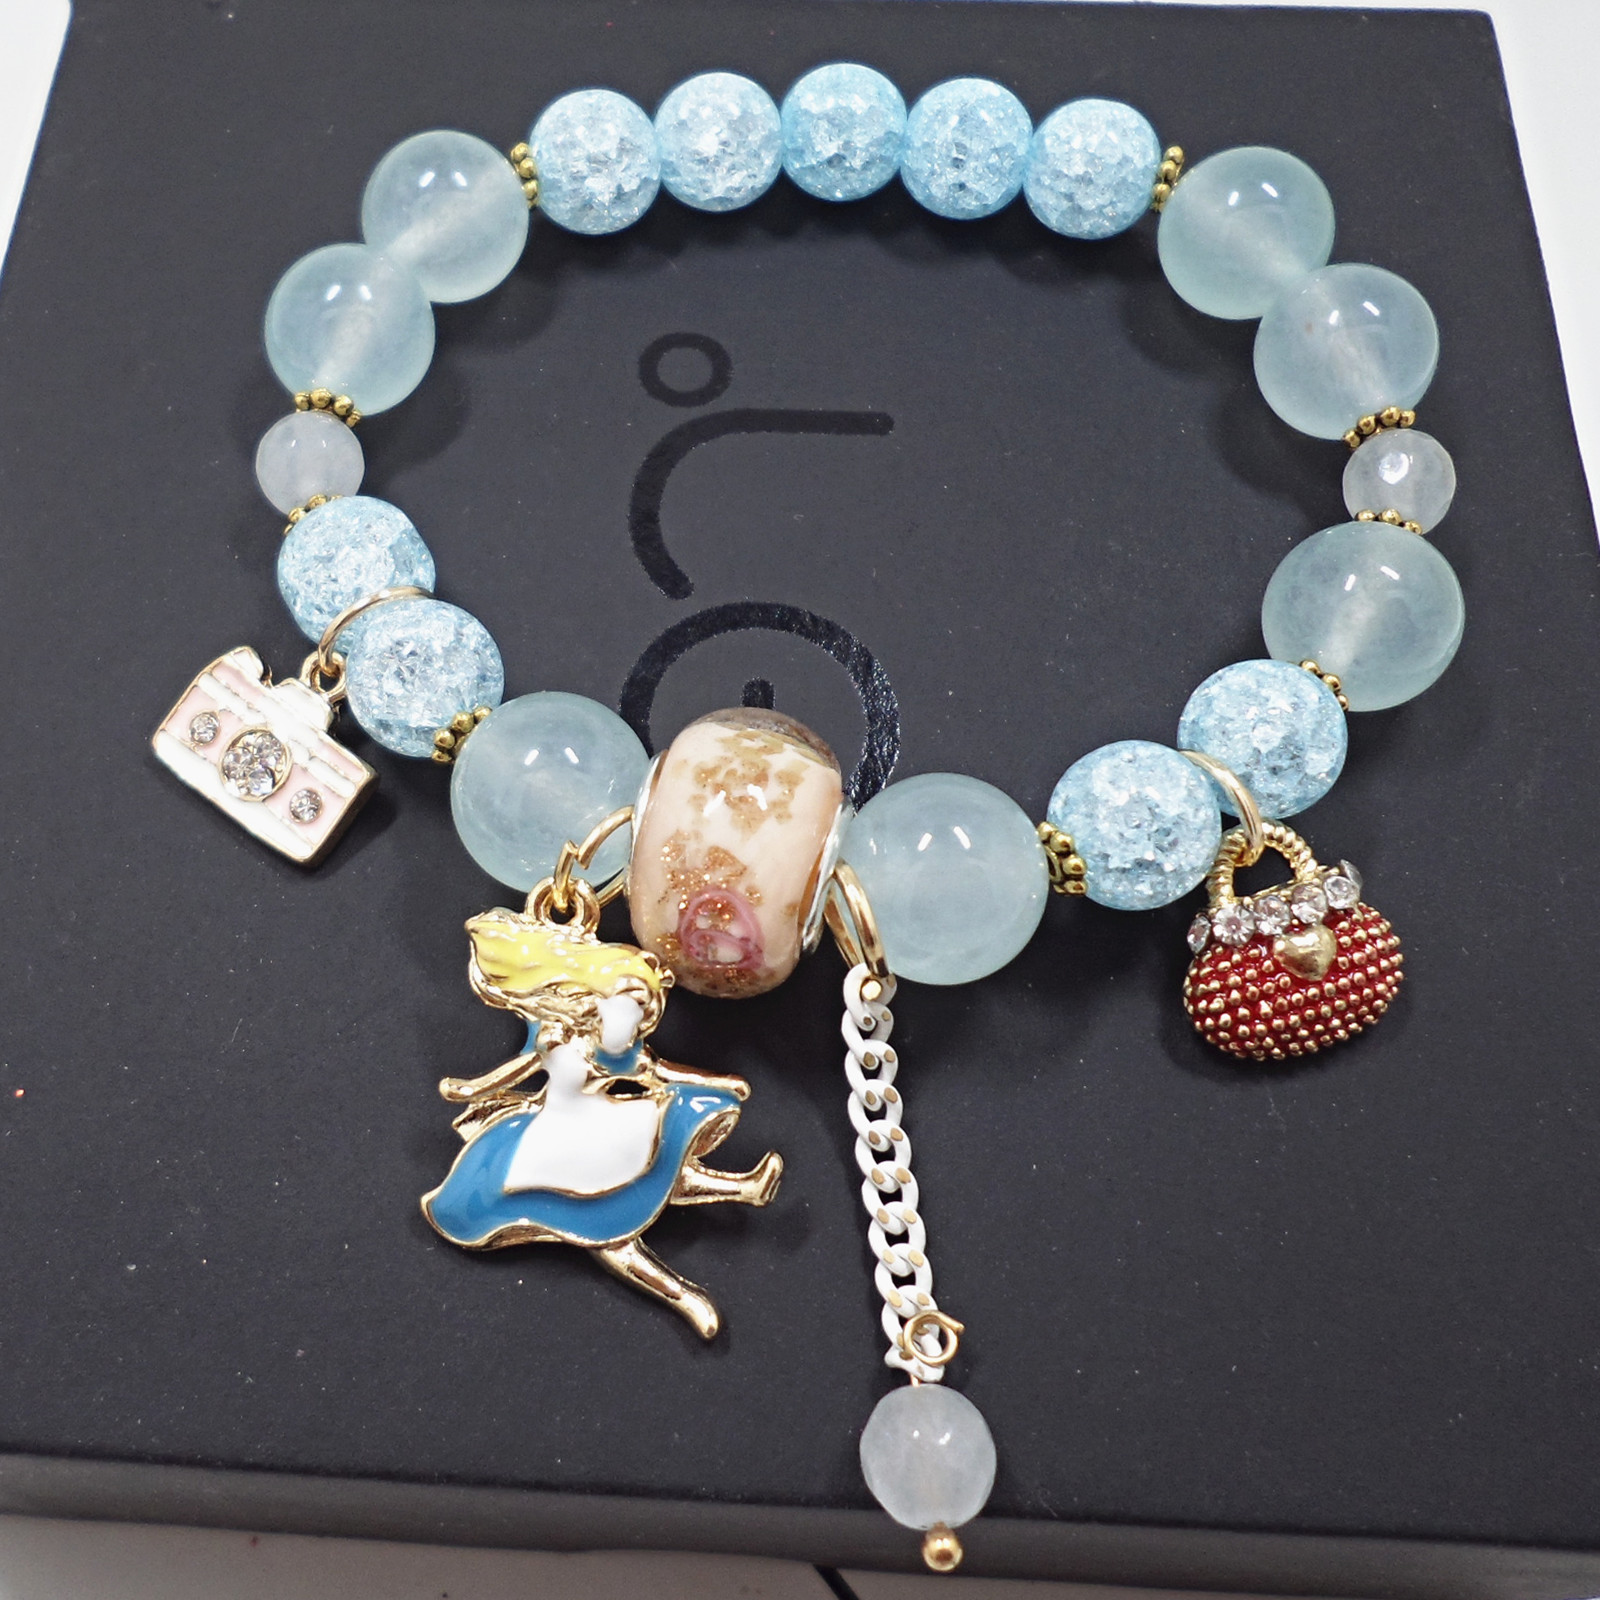 Wholesale Bohemia Girl camera crystal Bead Bracelets for Women creative jewelry wholesale Natural Stone Charms Wristband Gift  VGB097 2